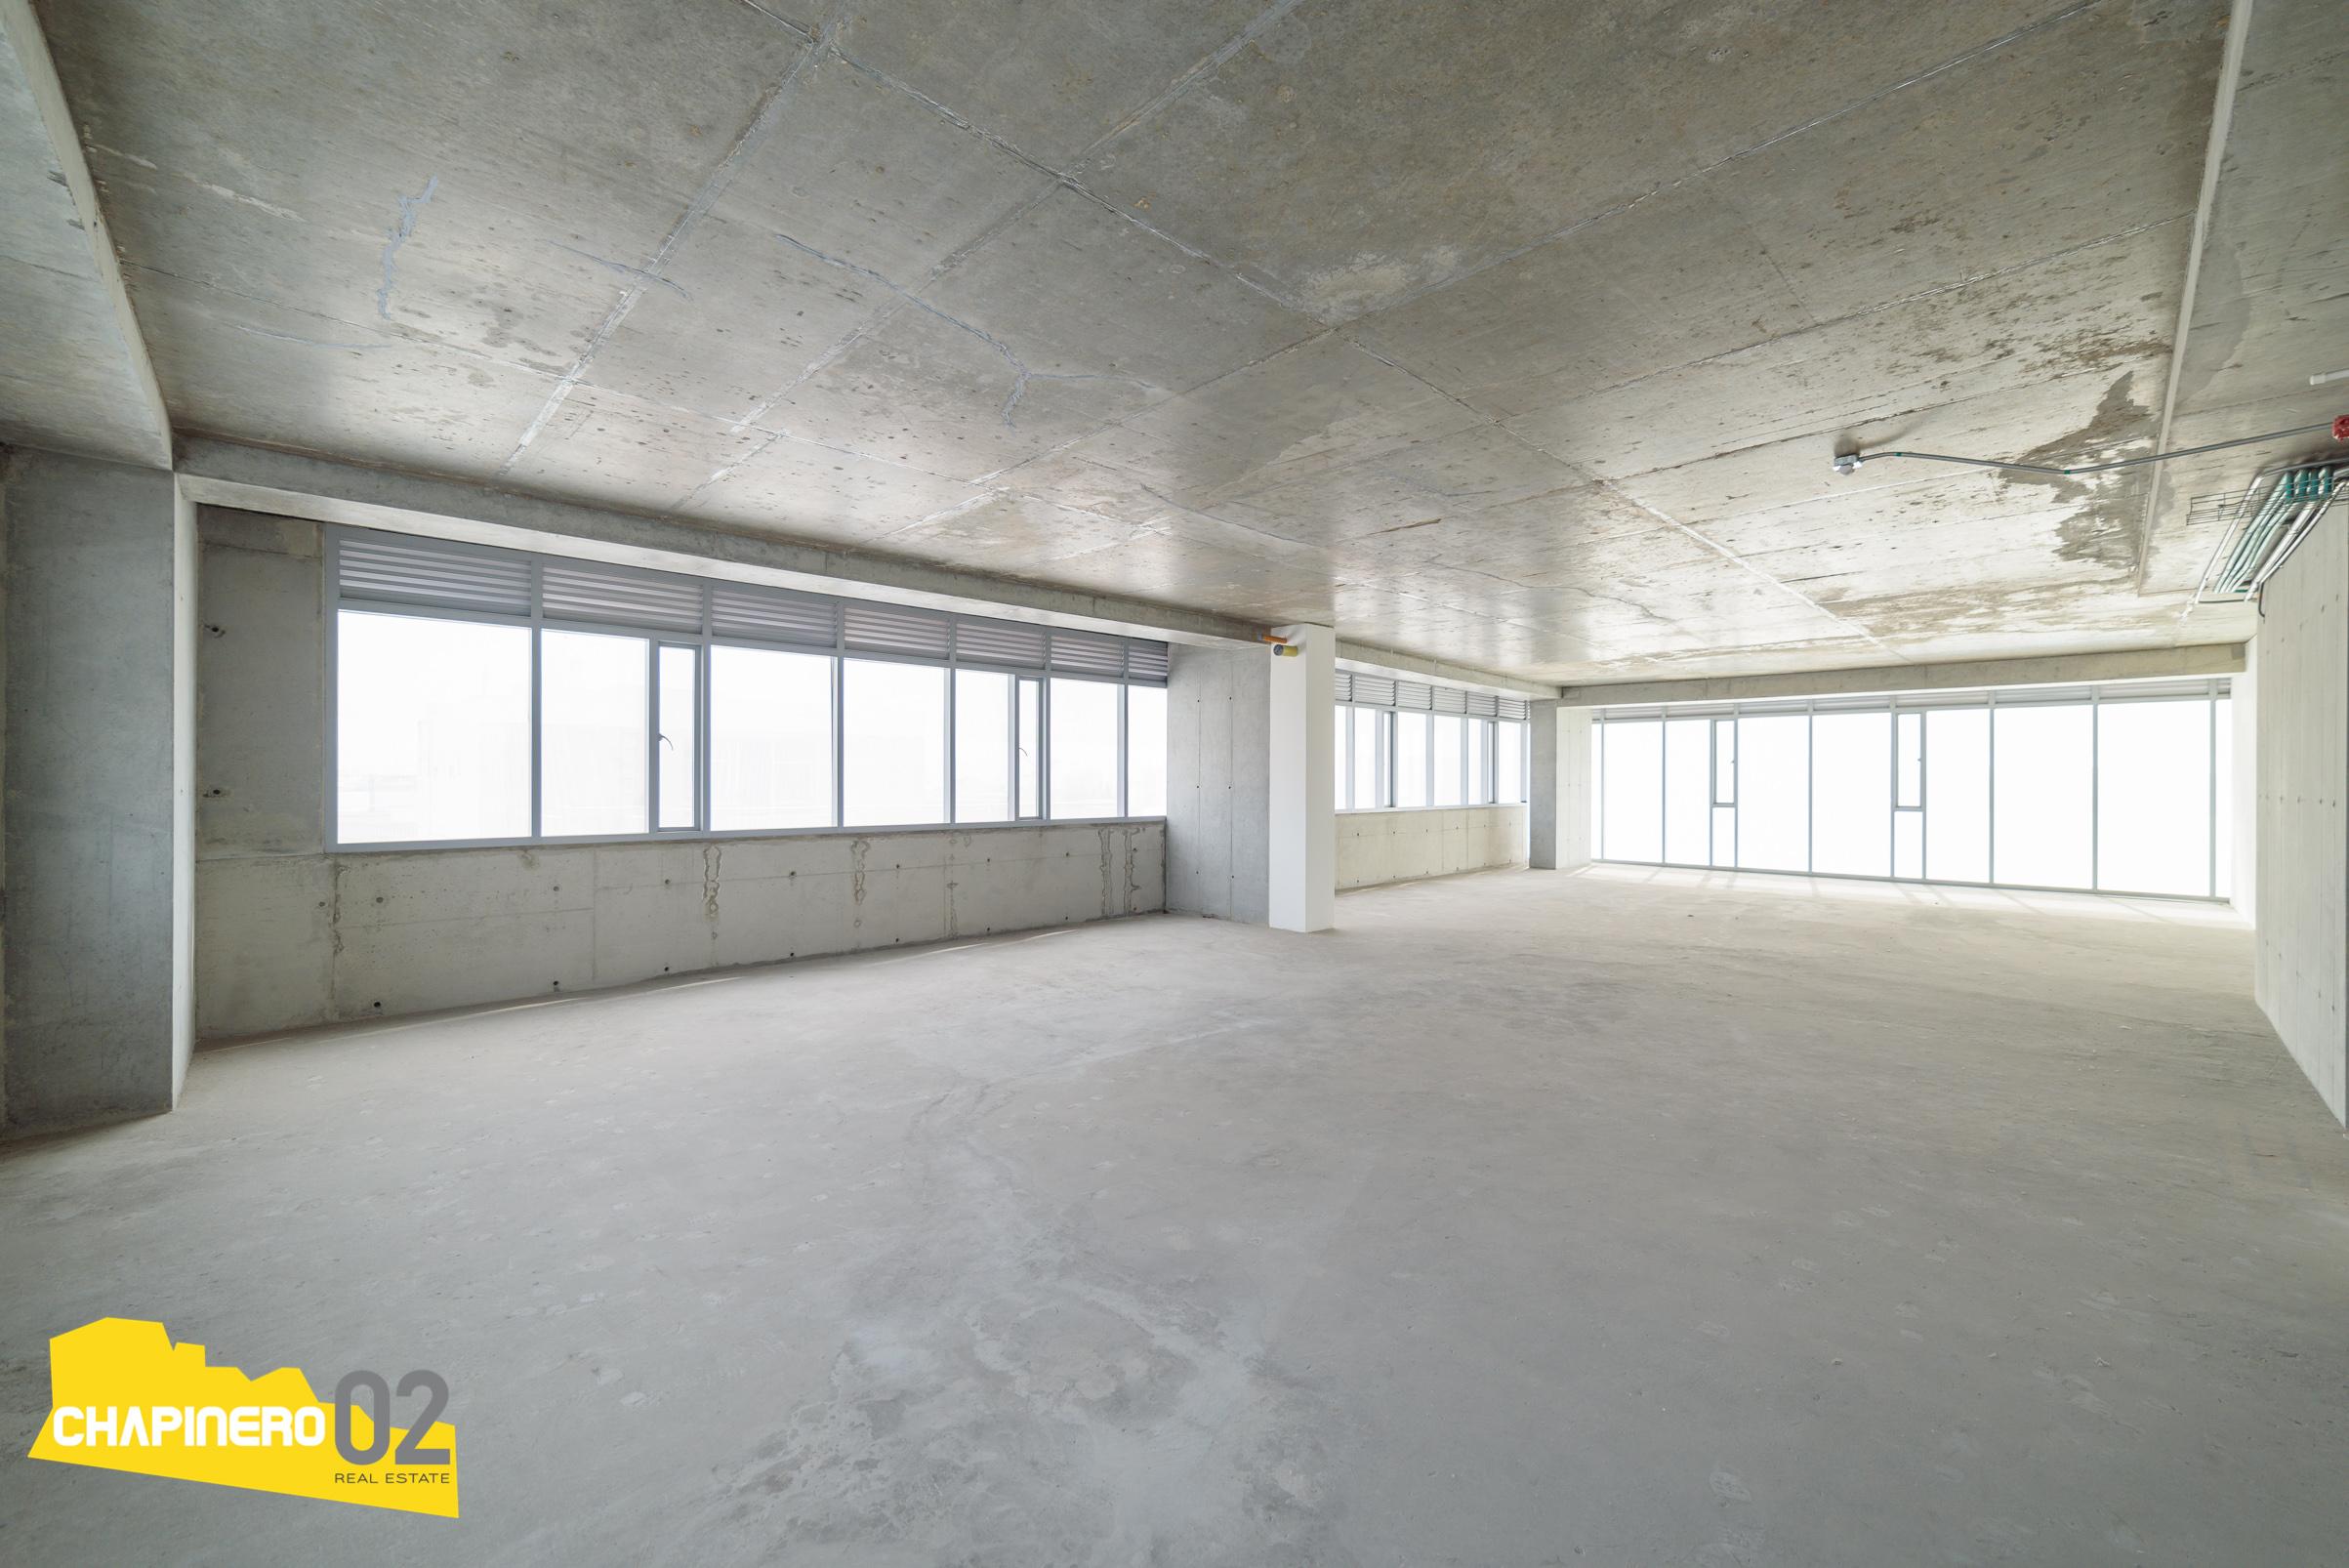 Oficina Venta :: 182 m² :: Chicó N III ::  $2.000M